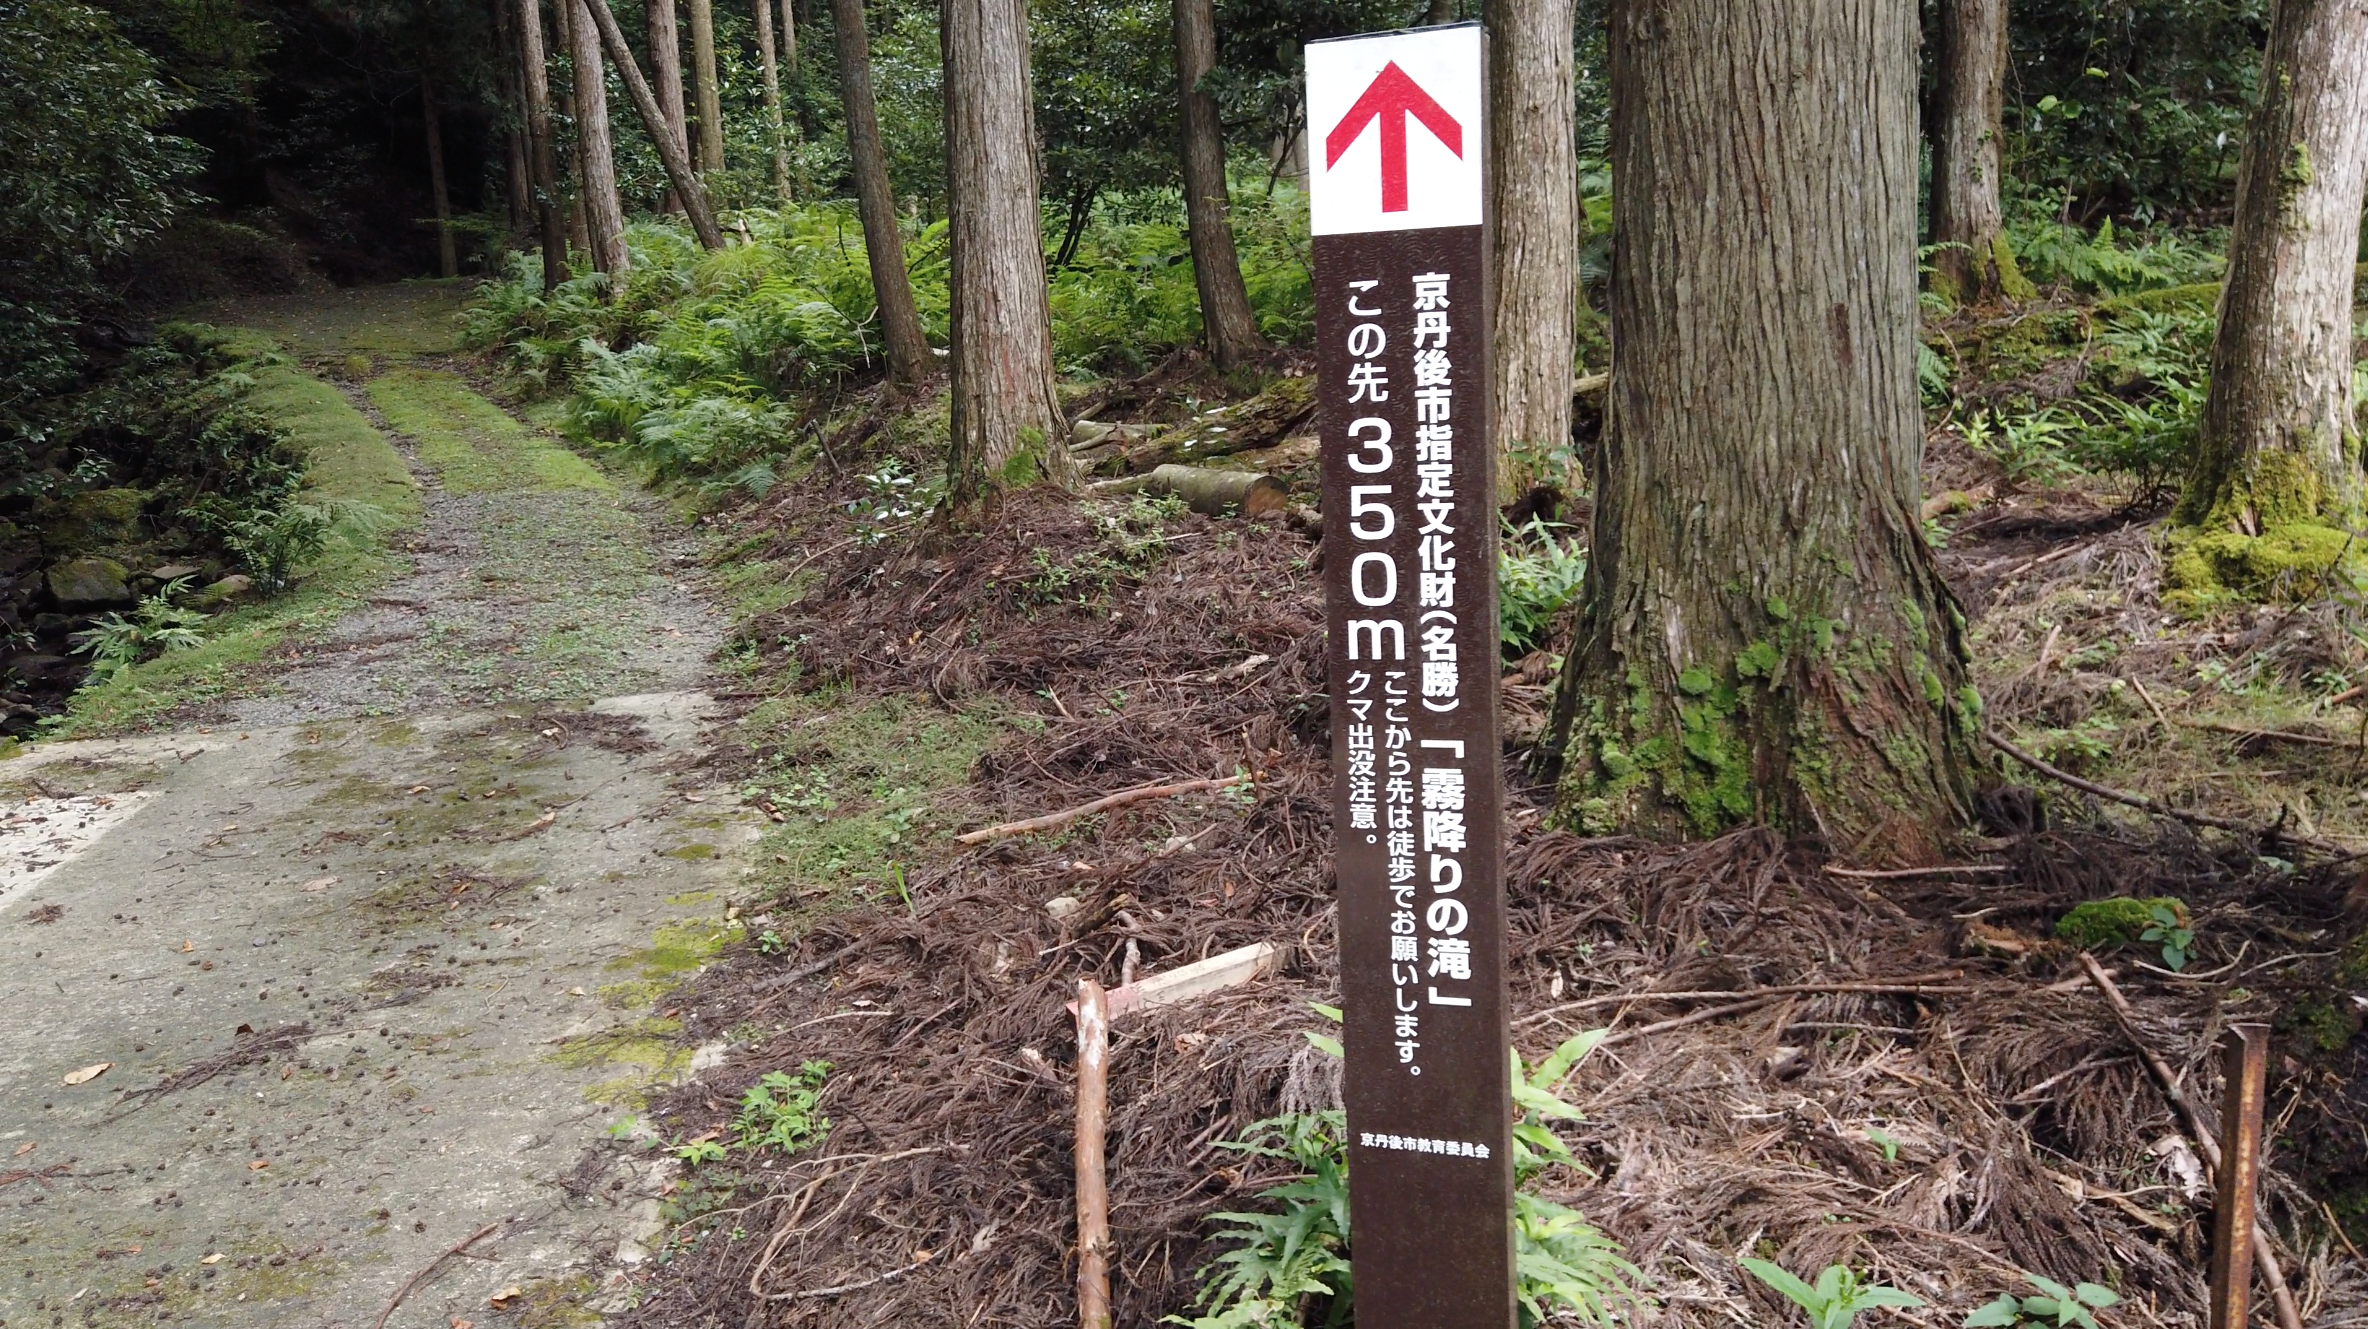 d797d151bc67ba0ee2039e7bb576a60b 京都府    霧降りの滝 ( 京都の丹後半島観光におすすめ! 滝が観れる撮影スポット! アクセス・駐車場情報や撮影ポイントなど!!)